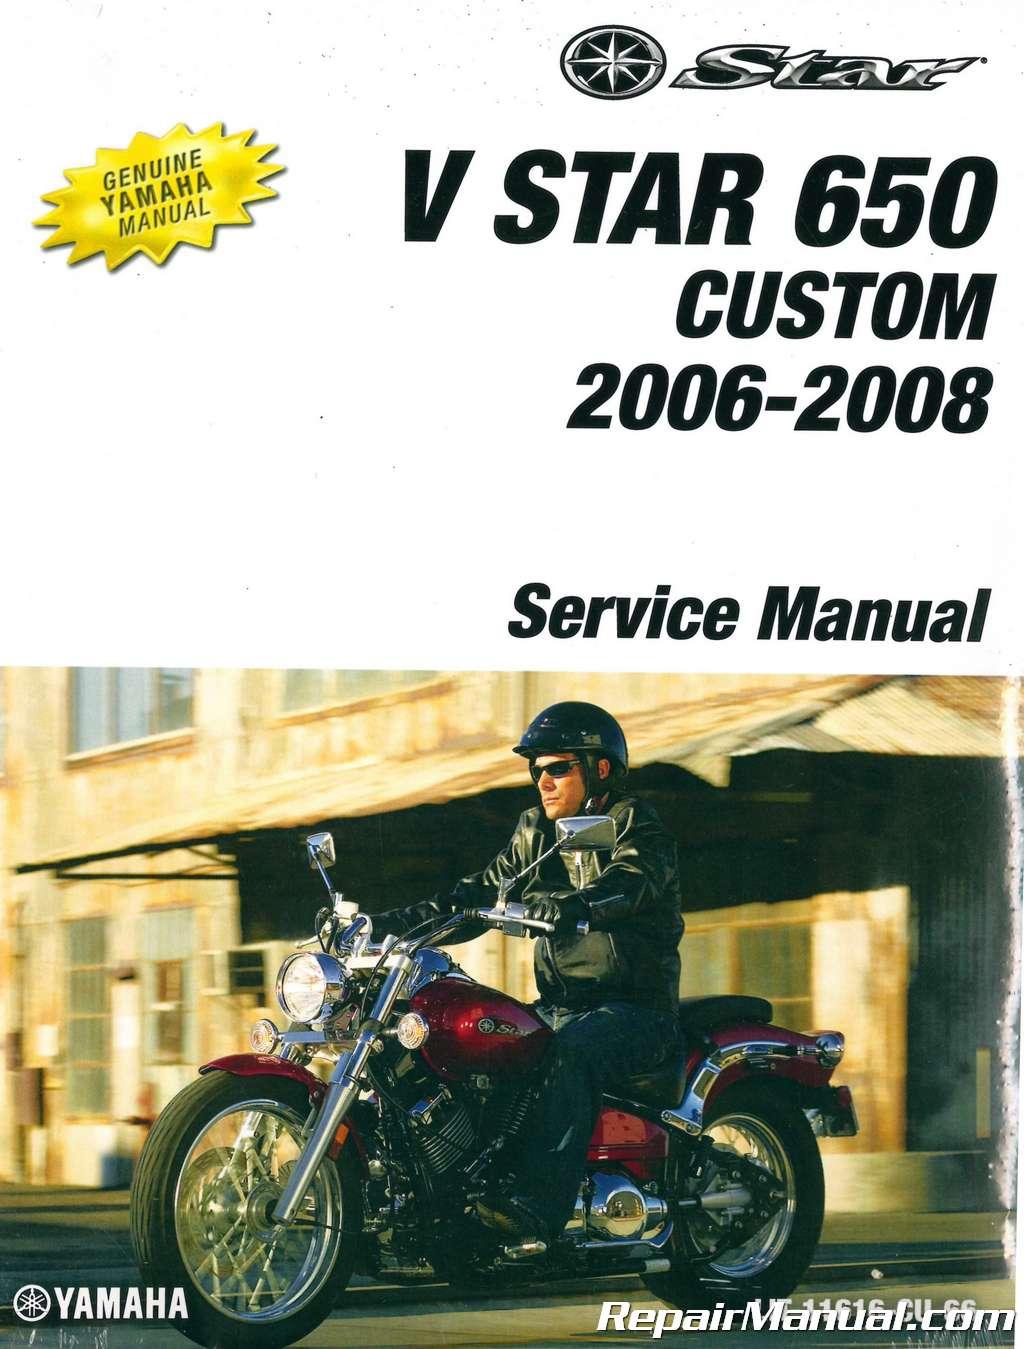 yamaha v star 650 parts manual